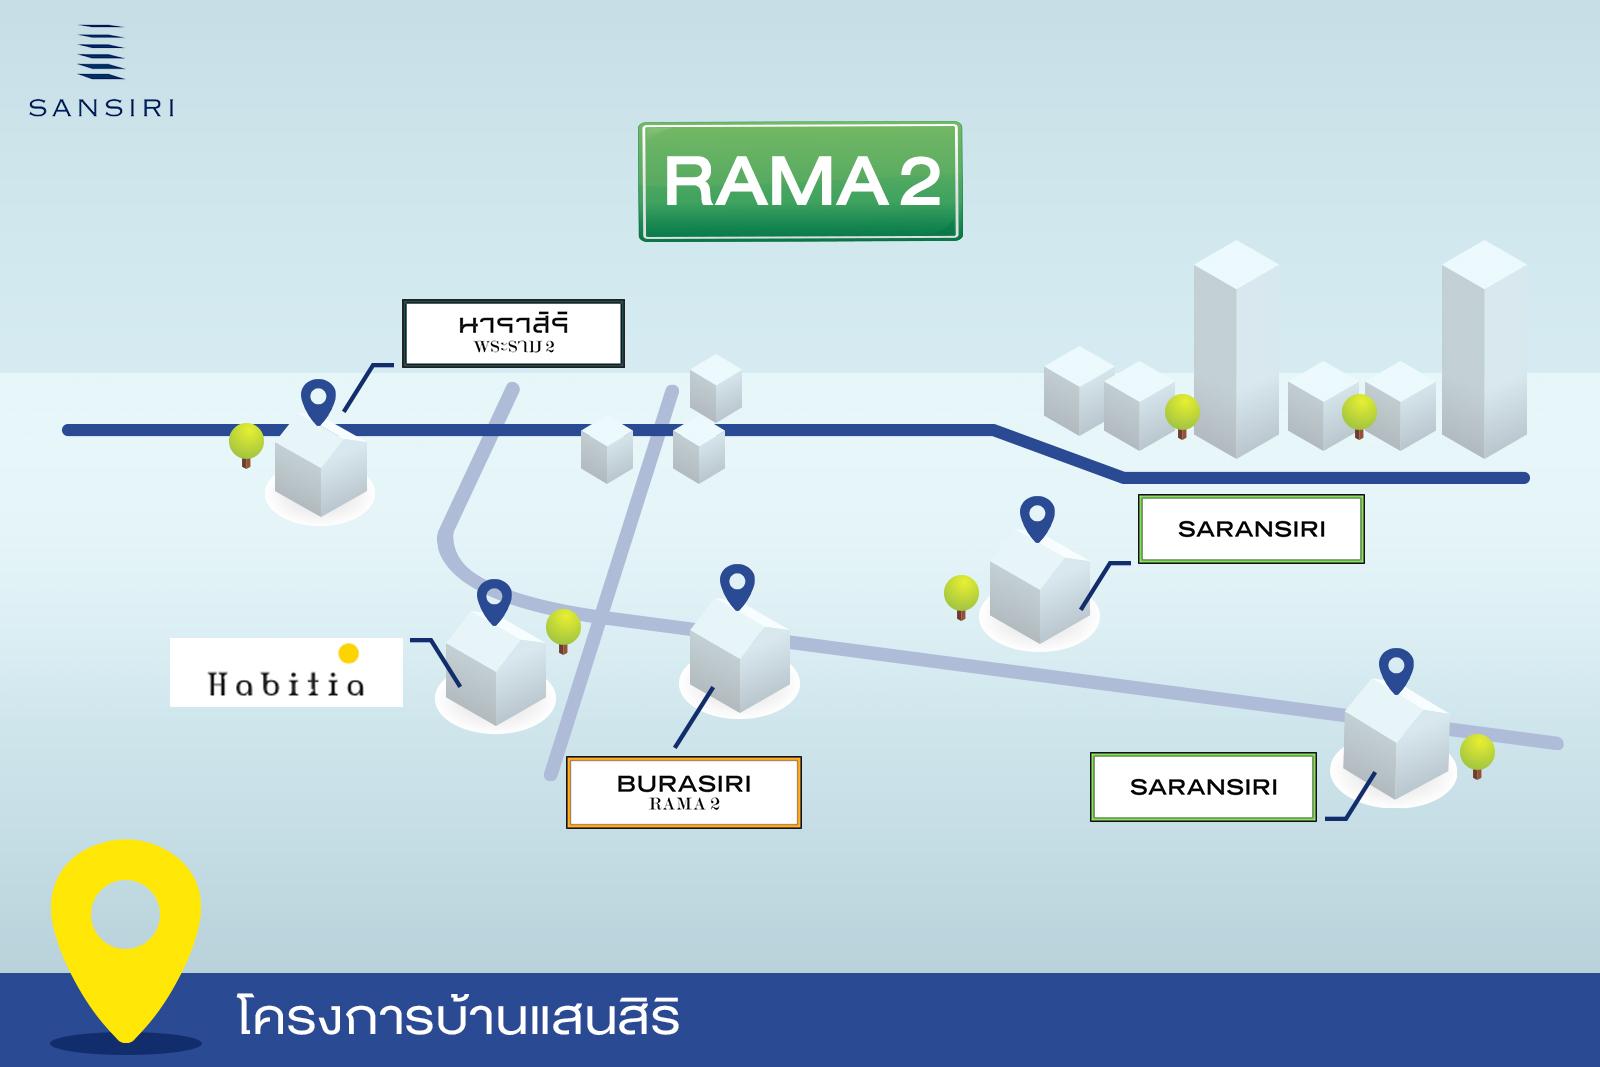 Rama 2 พระราม 2